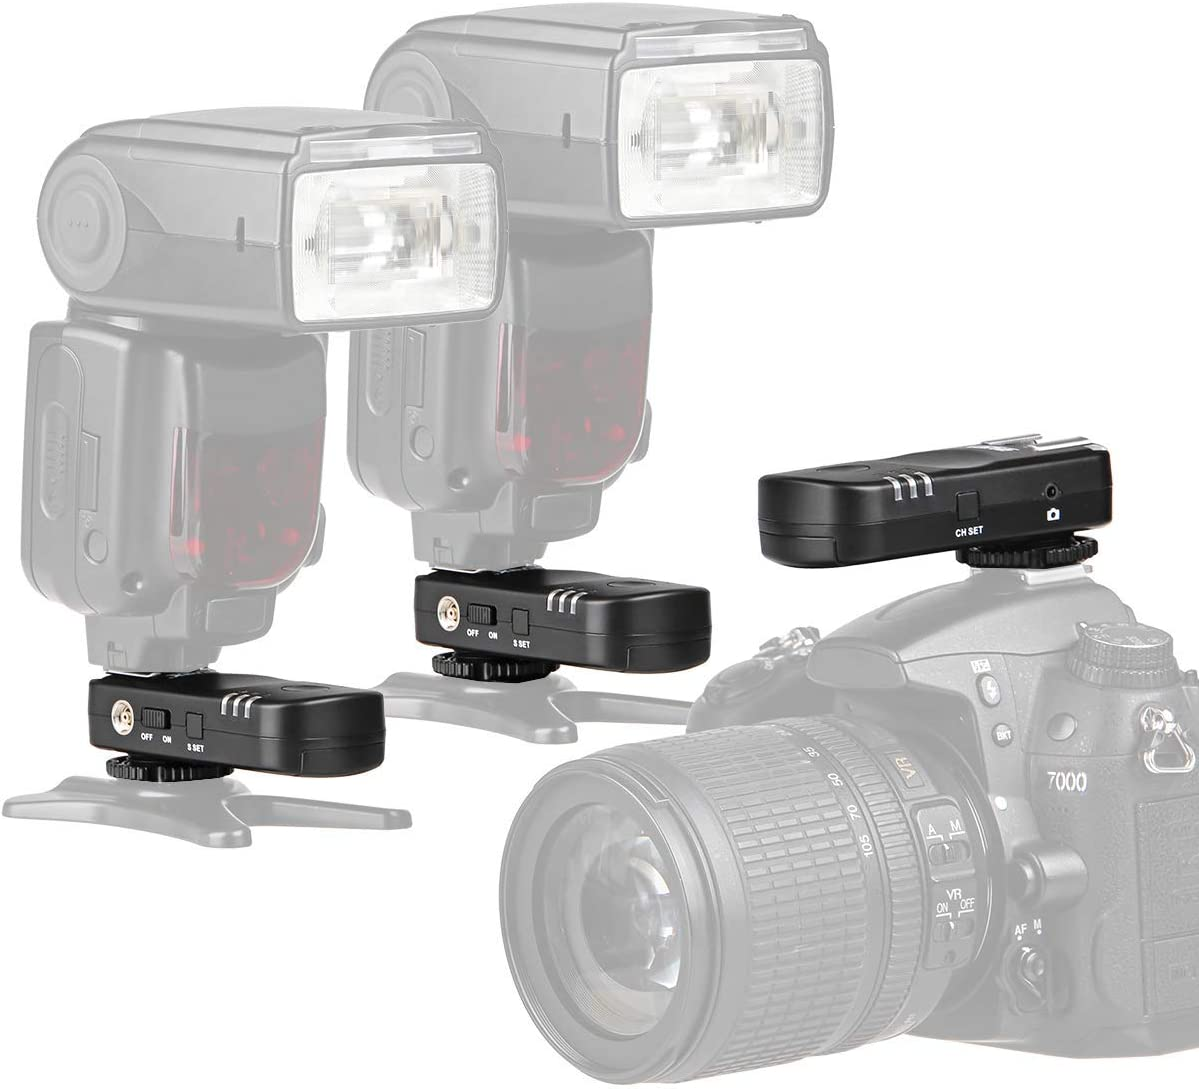 Blitz /& Kameraausl/öser Set mit 3 Transceivern AX-BA1 ayex Funk Blitzausl/öser und Kamera-Fernausl/öser f/ür Nikon Kameras